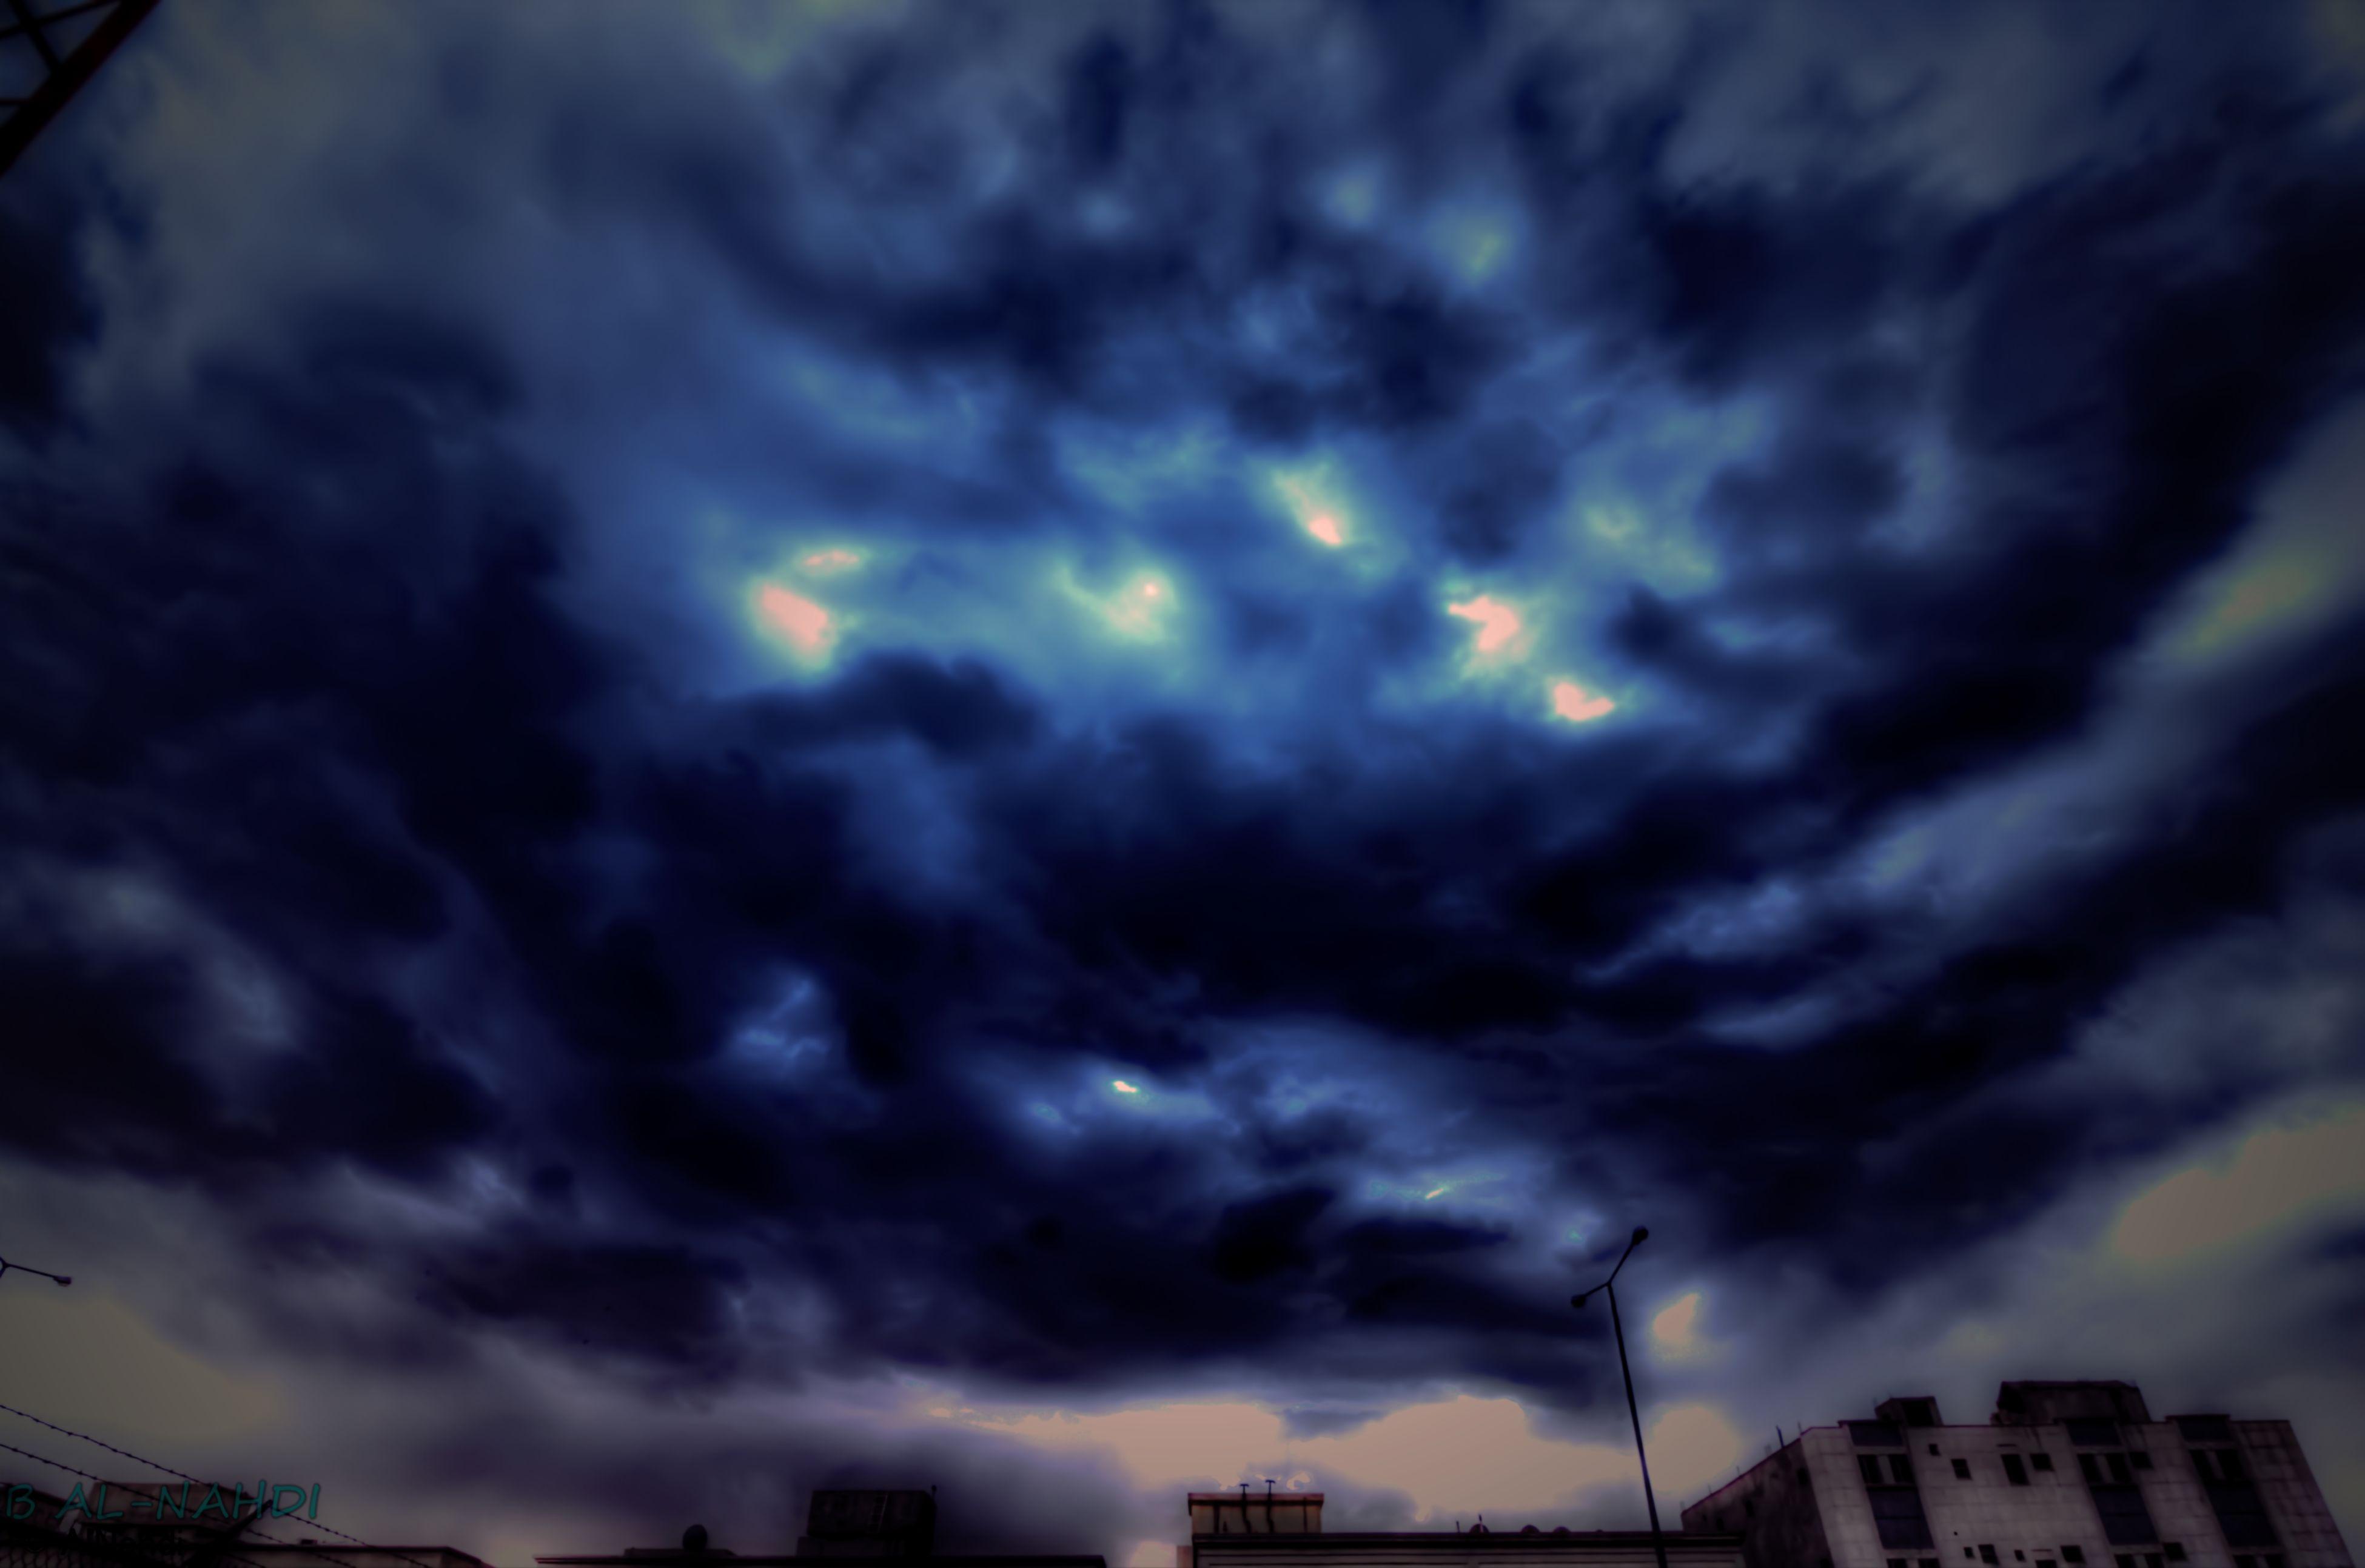 cloud - sky, sky, cloudy, weather, building exterior, storm cloud, low angle view, built structure, architecture, overcast, dramatic sky, city, atmospheric mood, cloud, dusk, cloudscape, nature, building, silhouette, outdoors